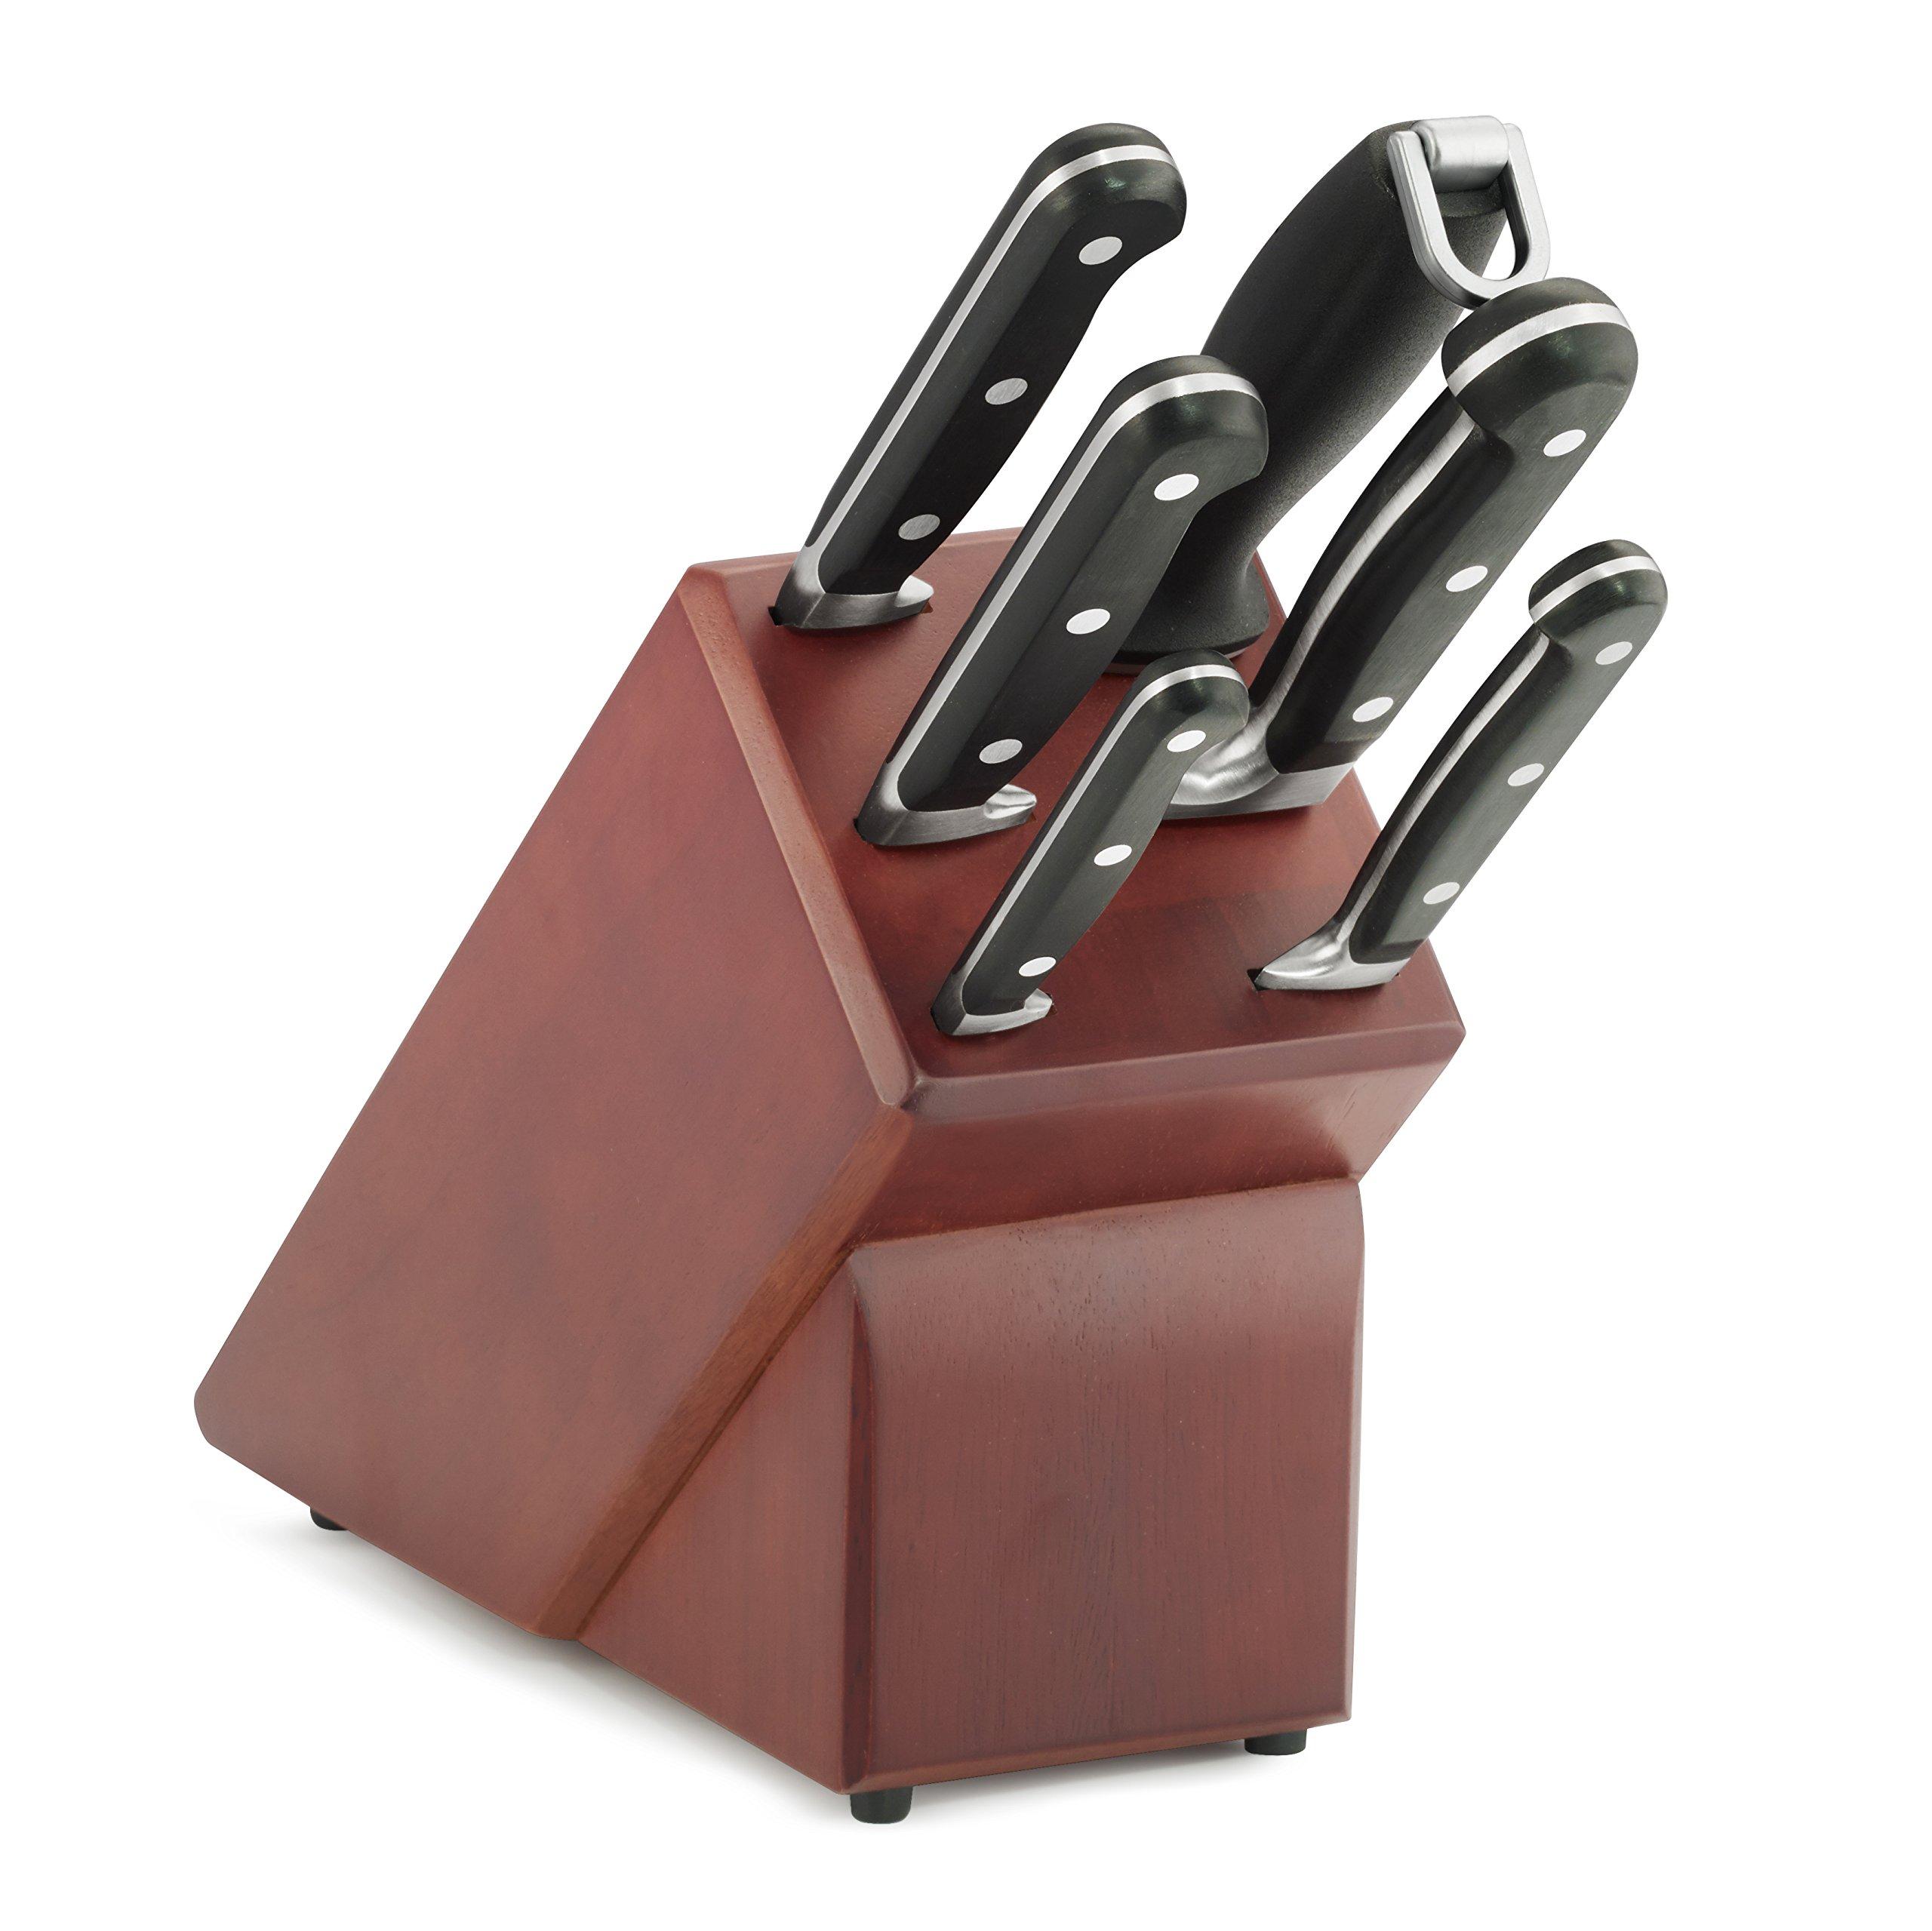 Tramontina M-400/07DS Cutlery Set 7-Piece